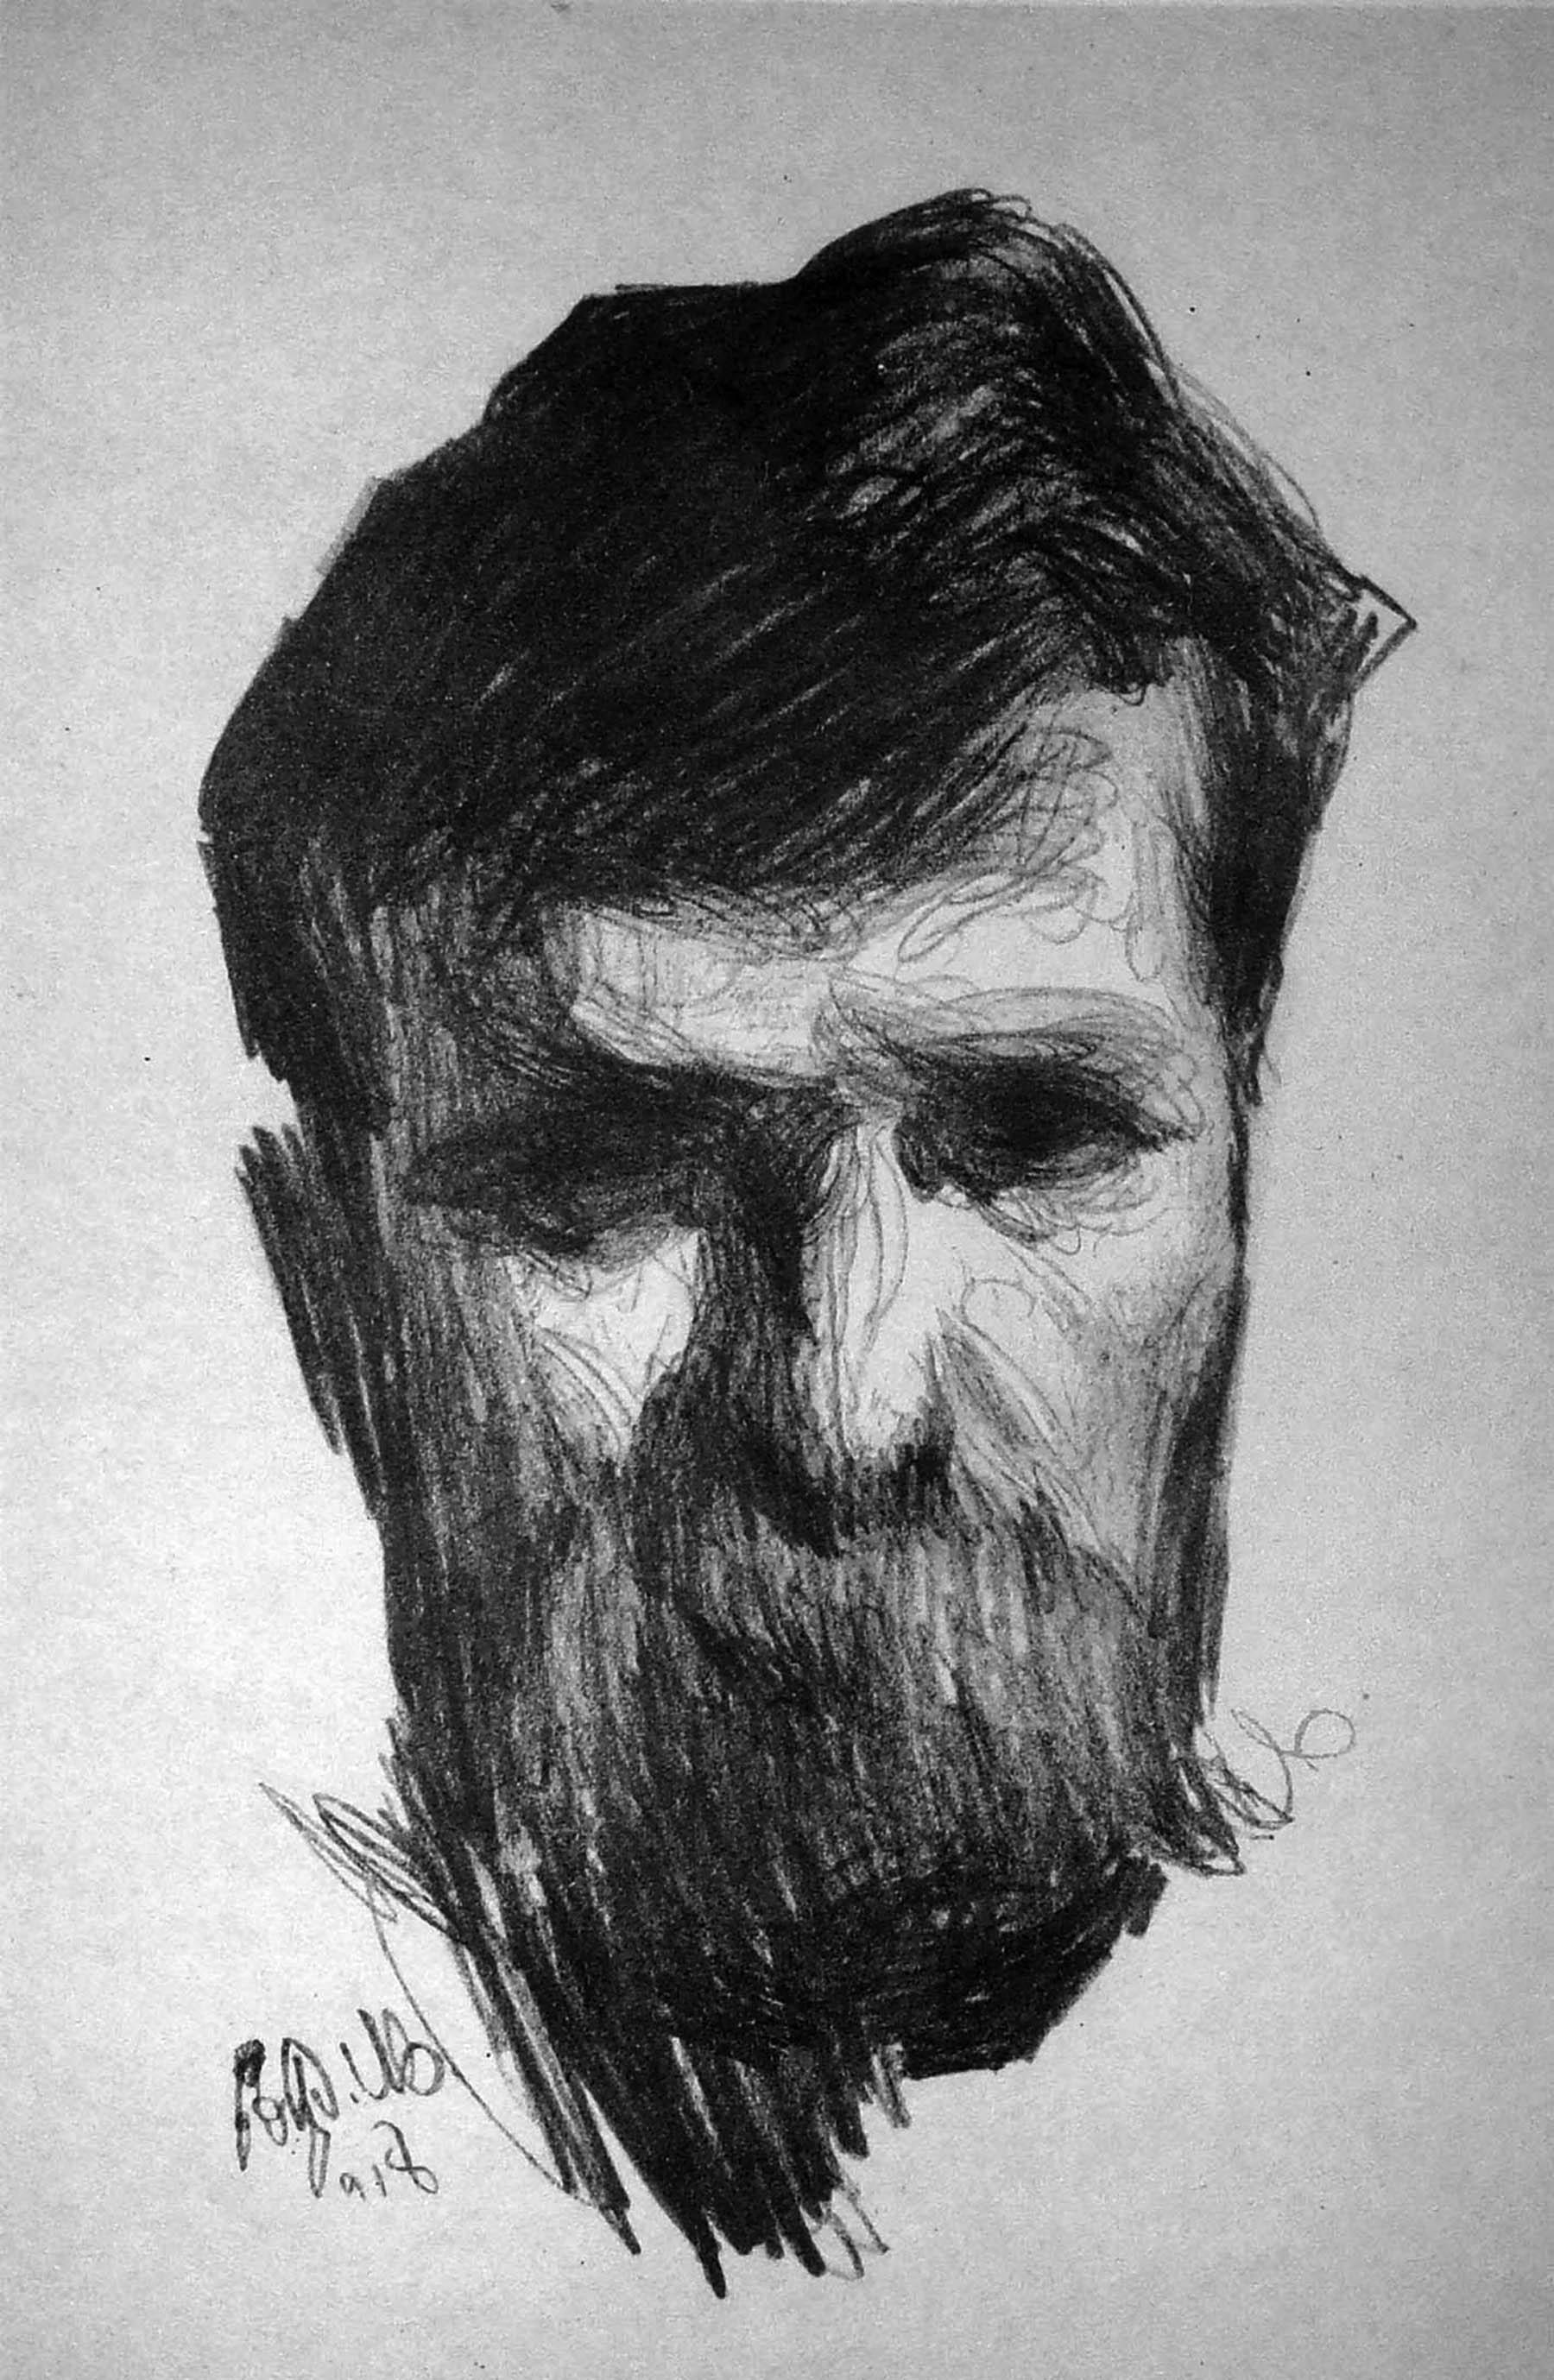 autoportret, ljuba ivanovic